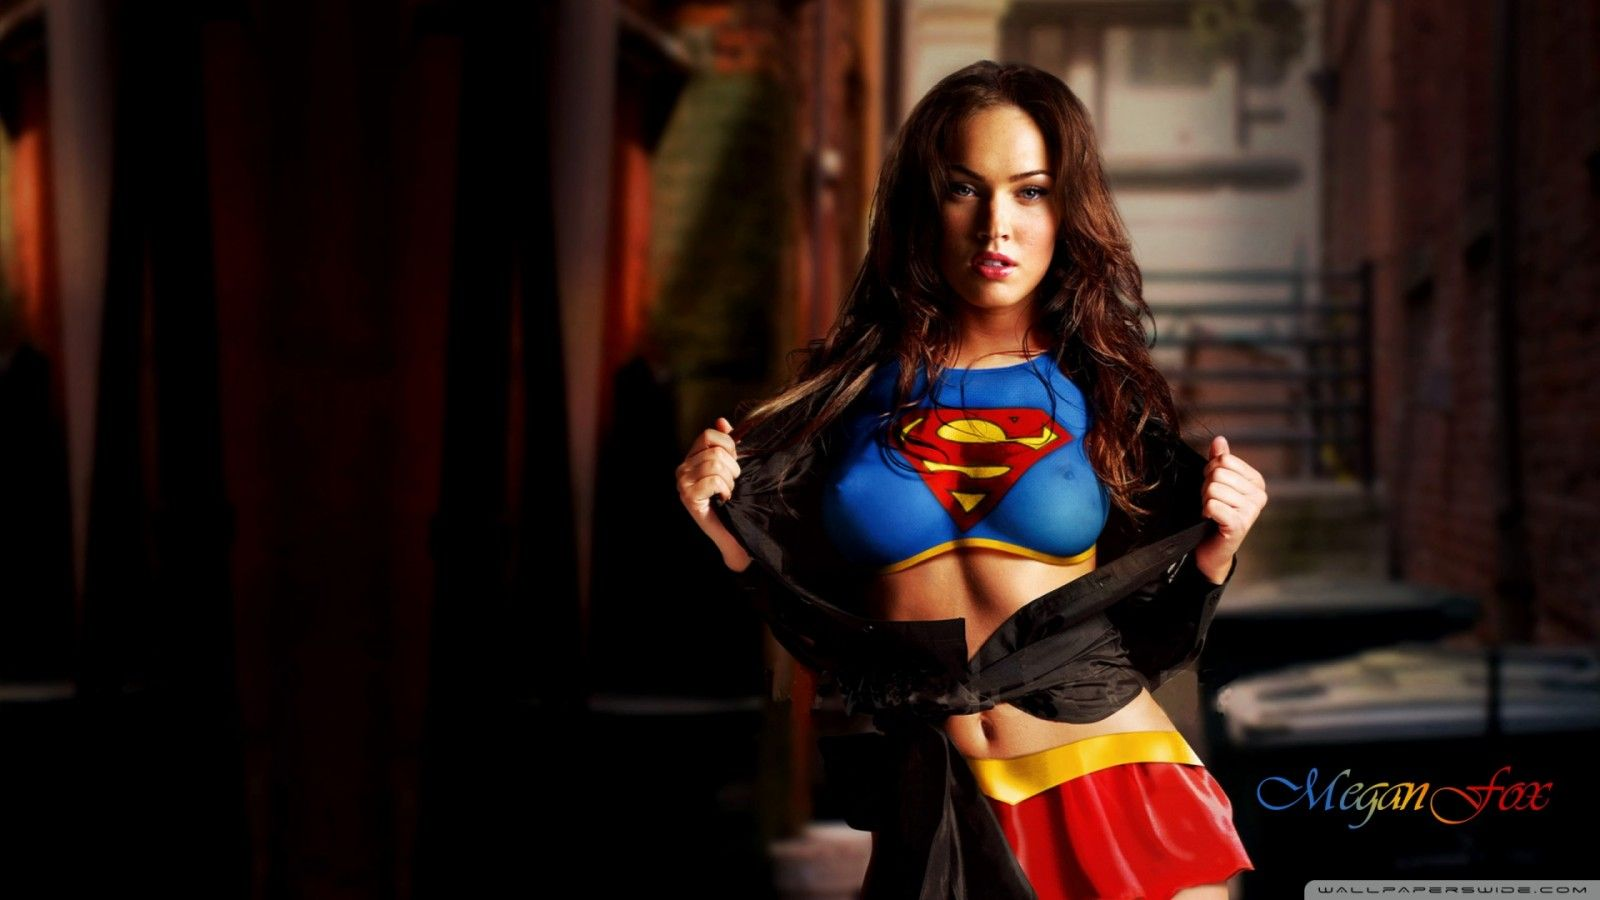 Hd wallpaper superman - Megan Fox 2013 Superman Hd Wallpaper Yoyo